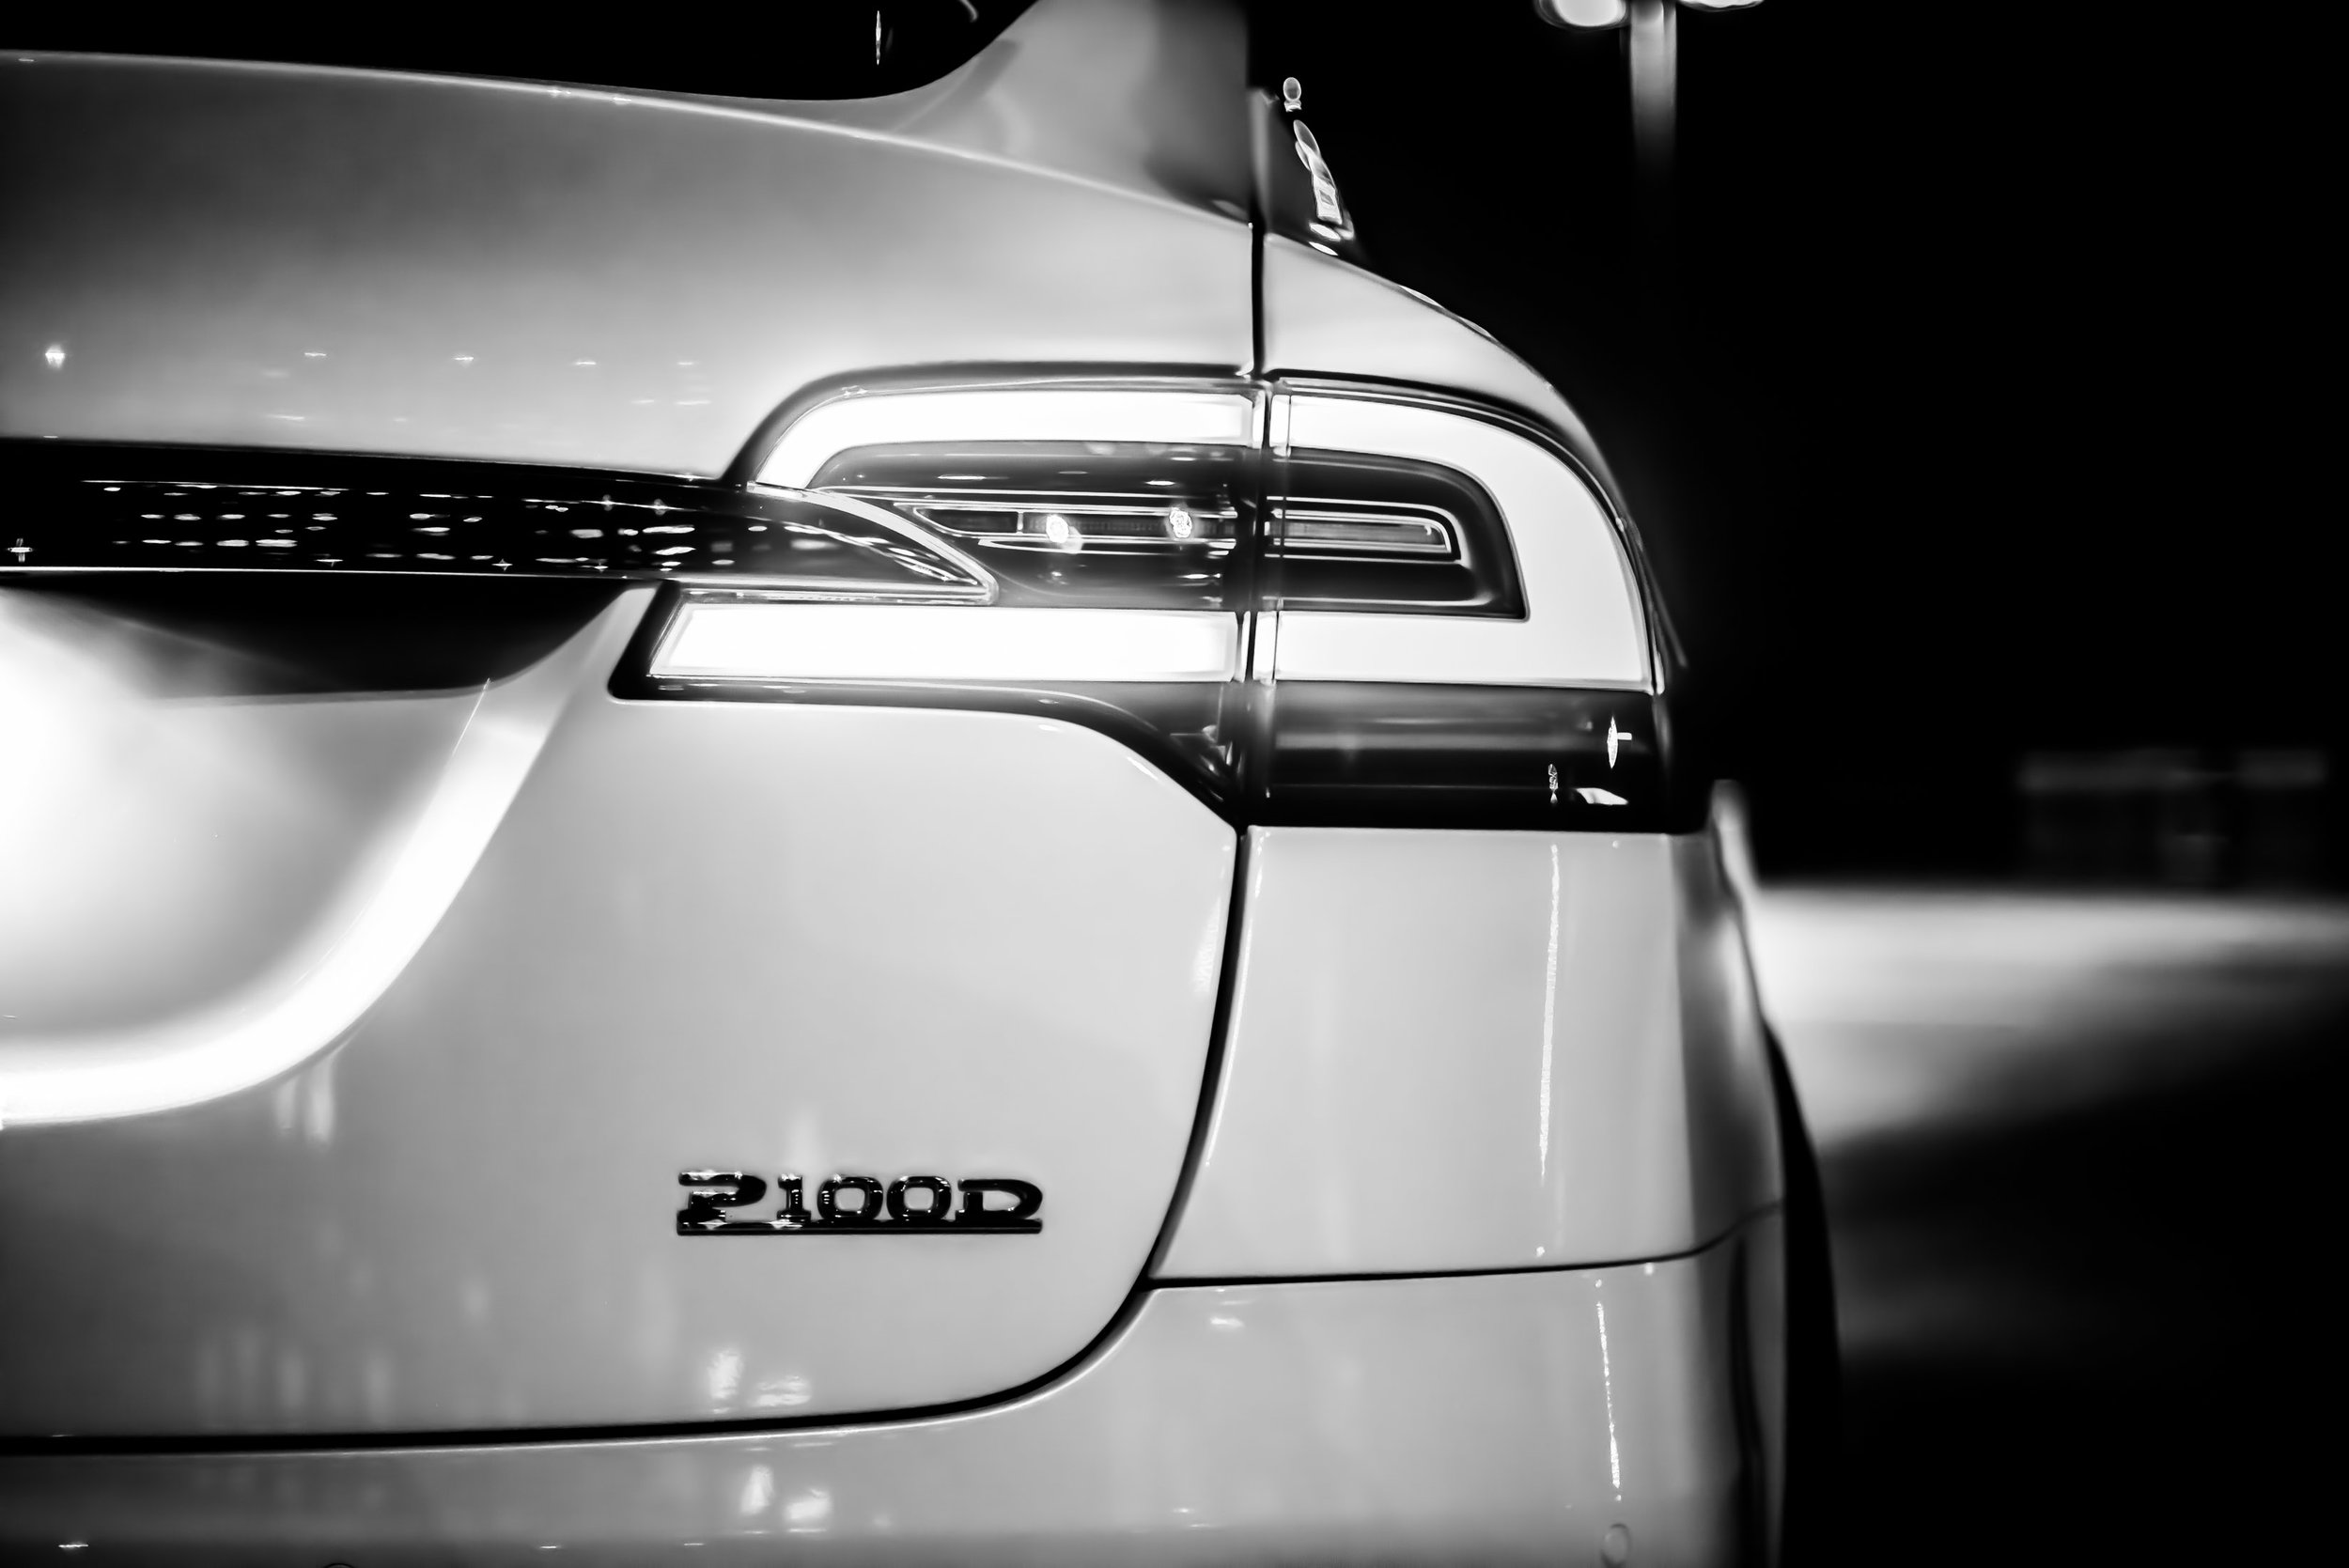 fleet+vehicle+sexy+car+photo+video+speed+tesla+p100d+vadym+guliuk+photography-16.jpg